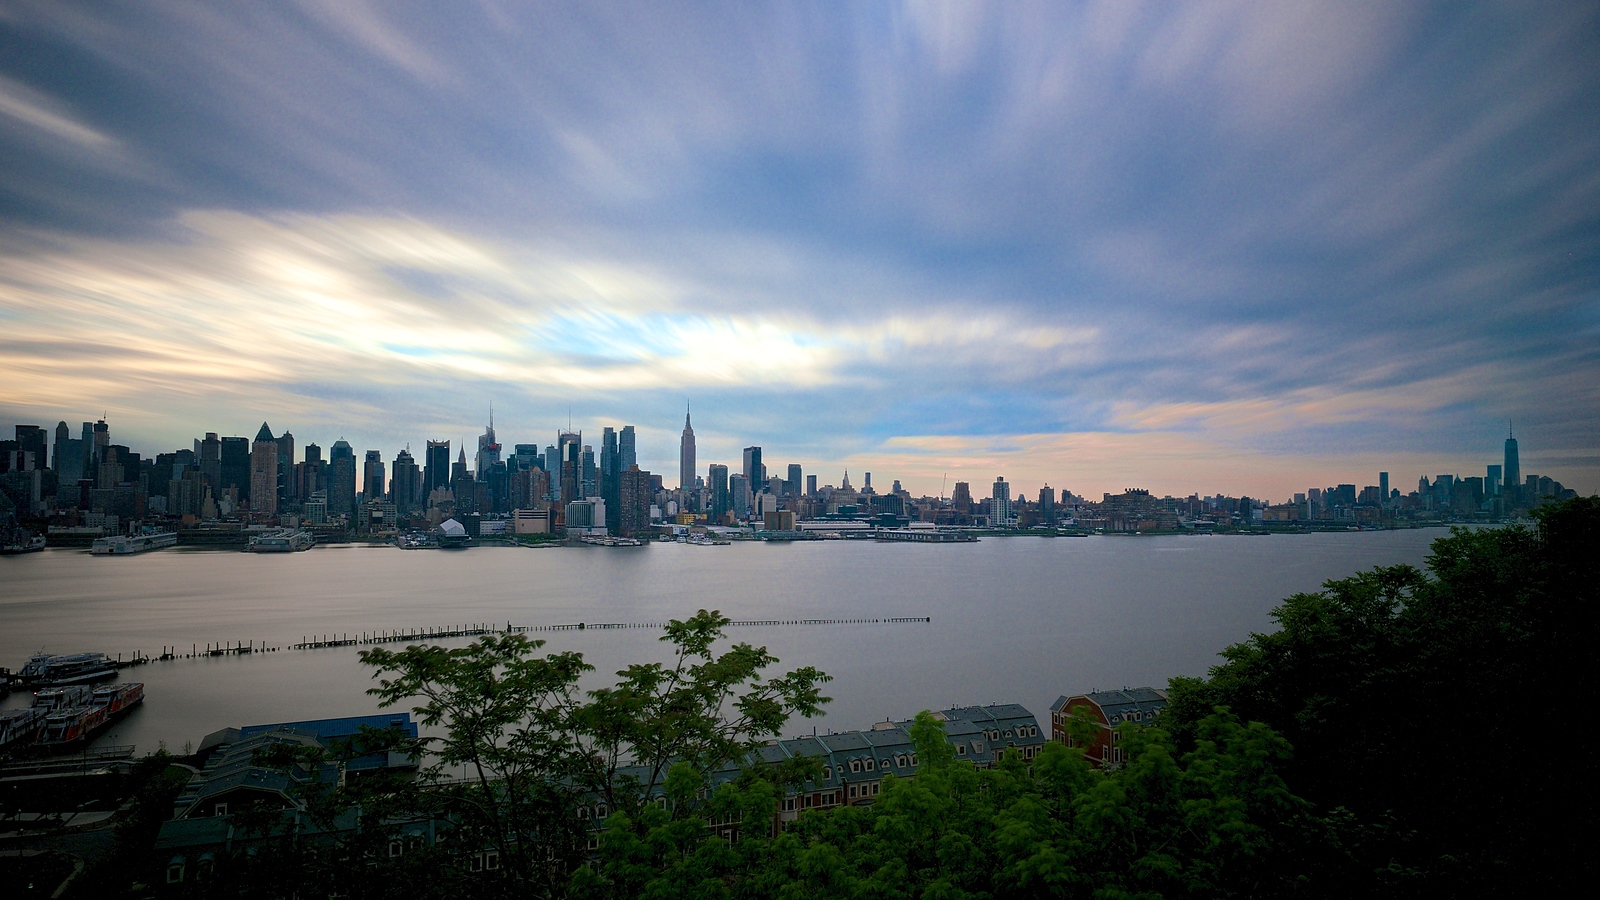 Manhattan Skyline - Long Exposure From Weehawken